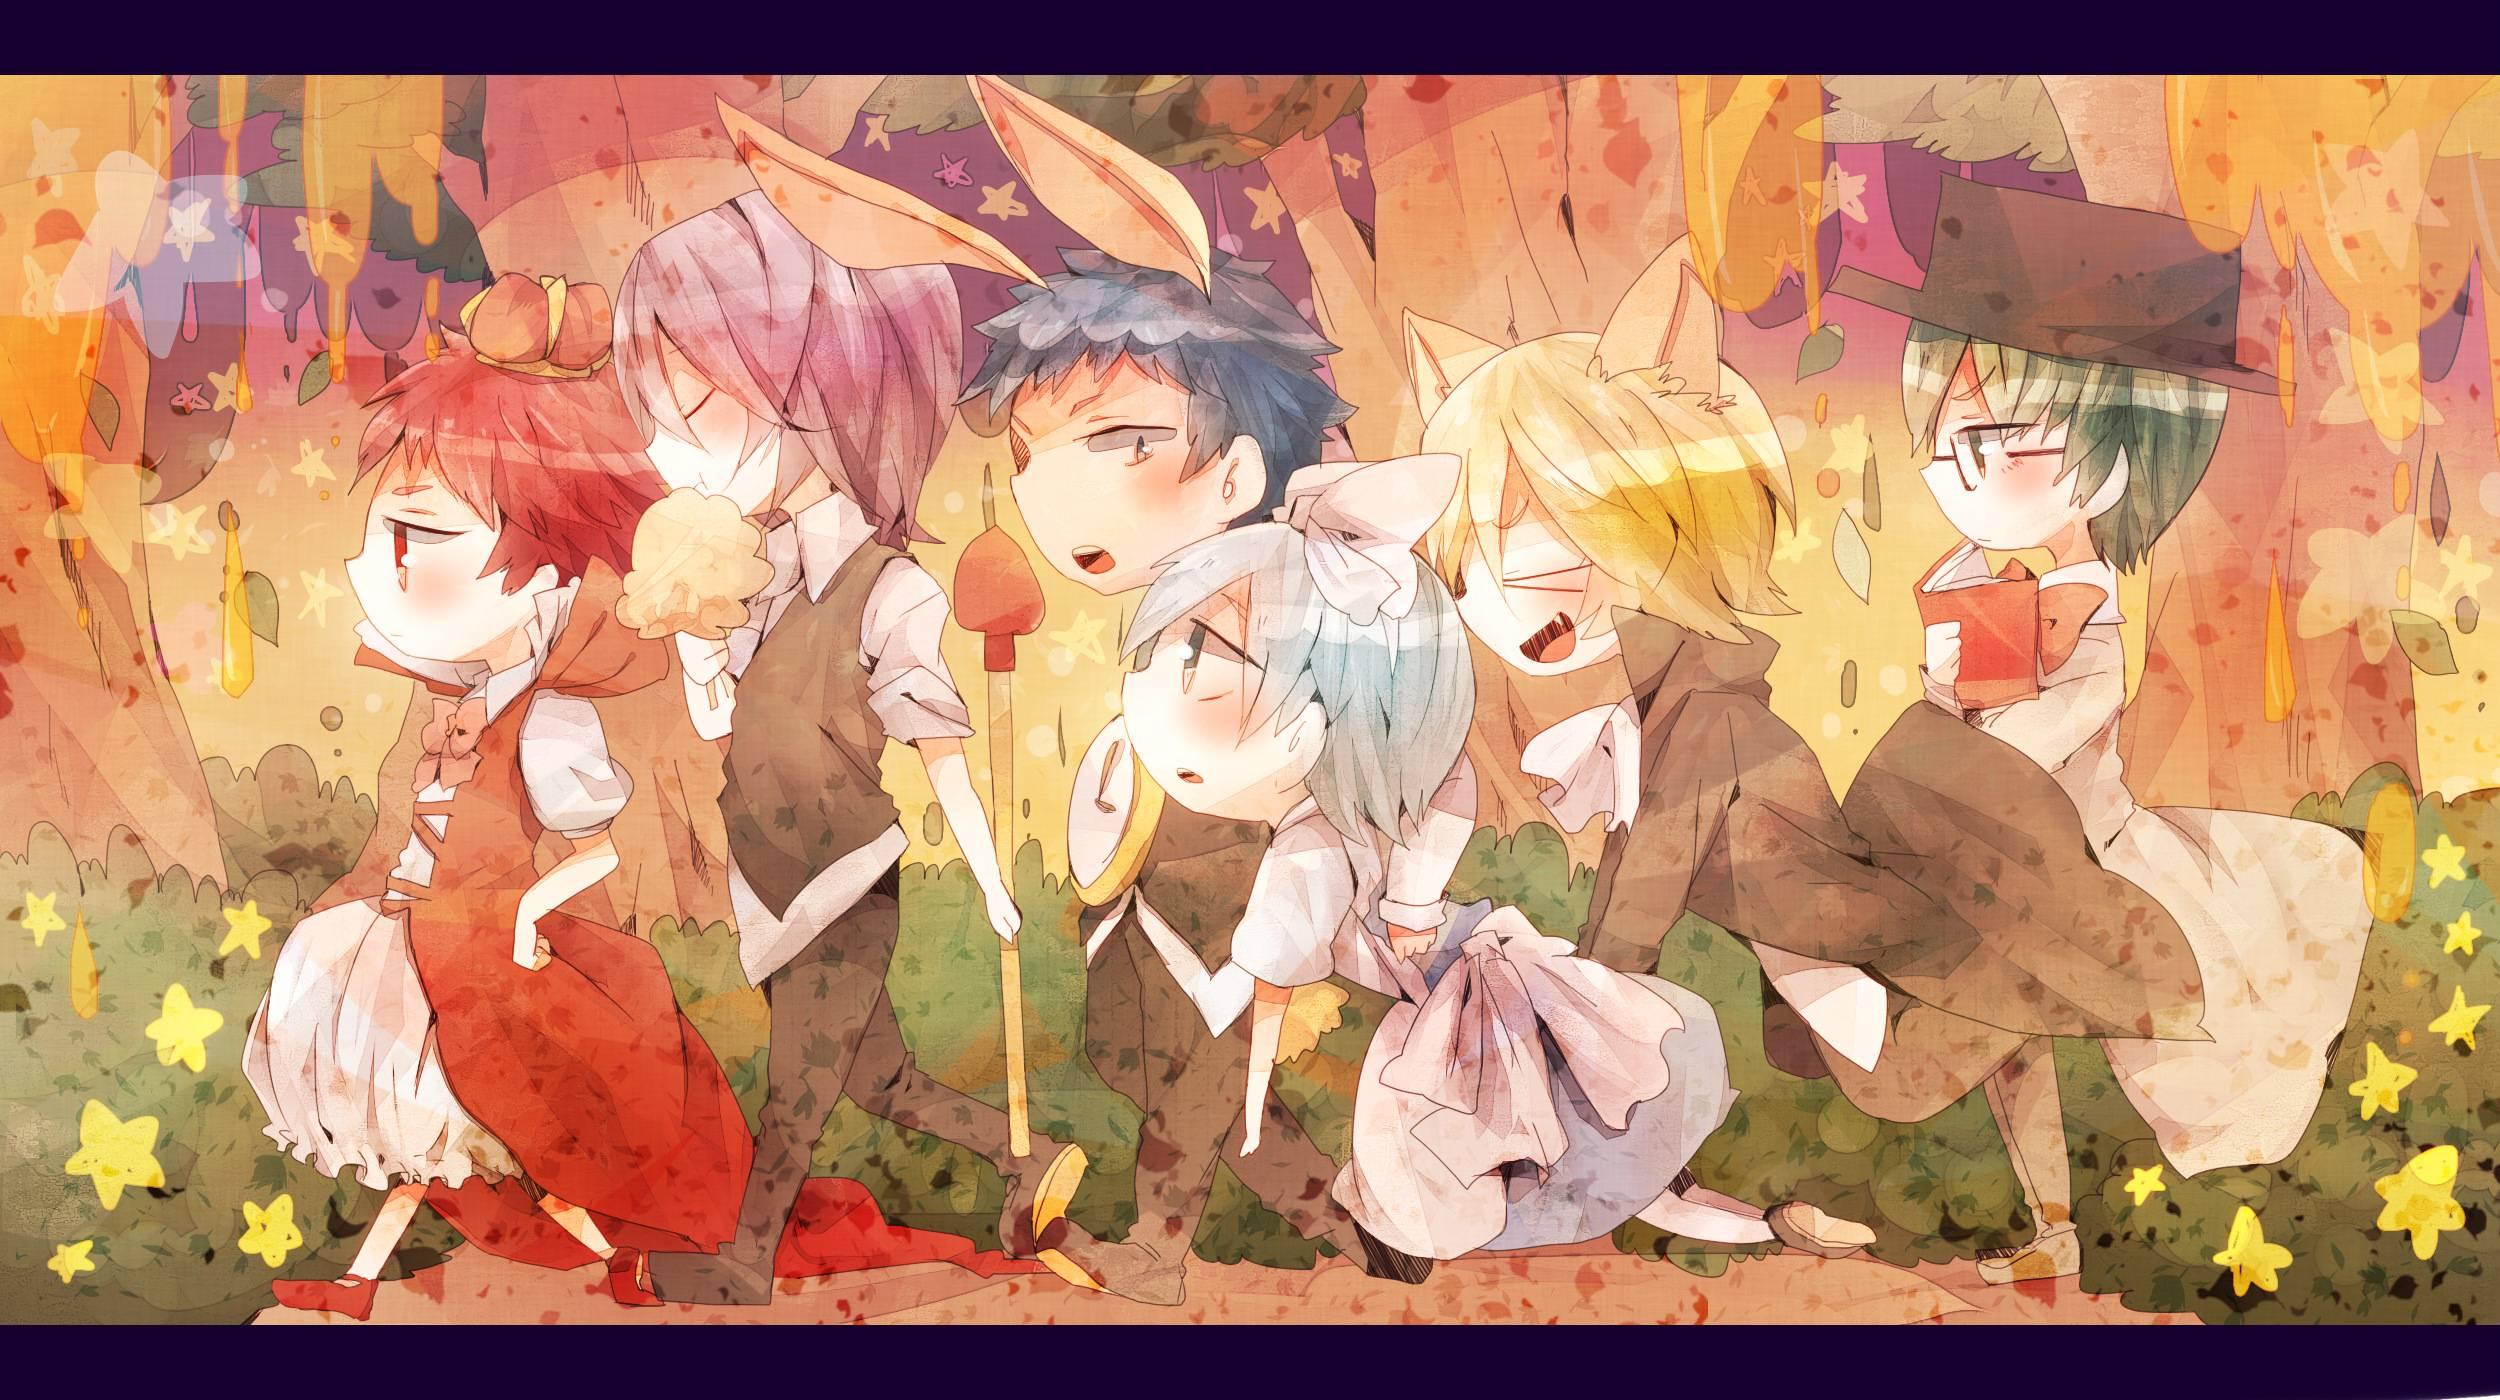 anime_wallpaper_Kuroko_no_basket_010993932.jpg